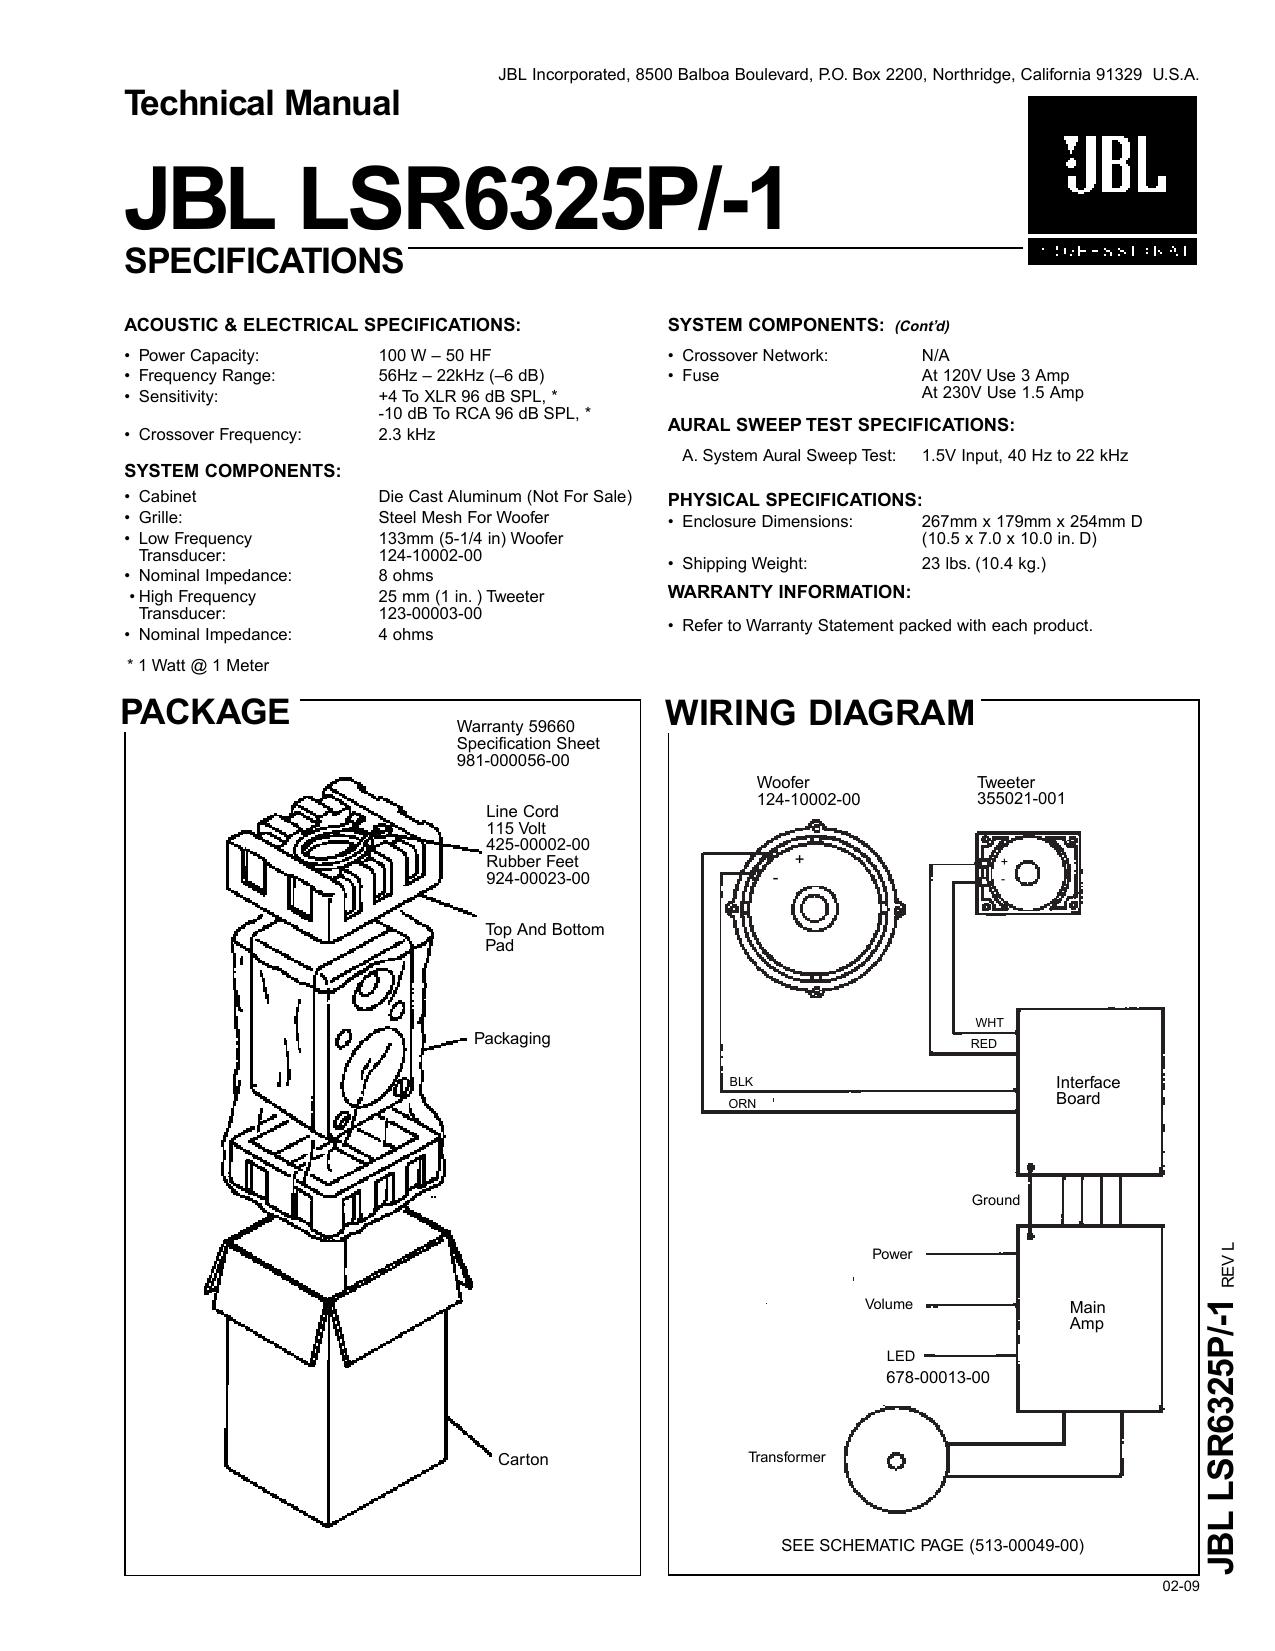 JBL LSR6325P/-1 - JBL Pro Service   Manualzz on